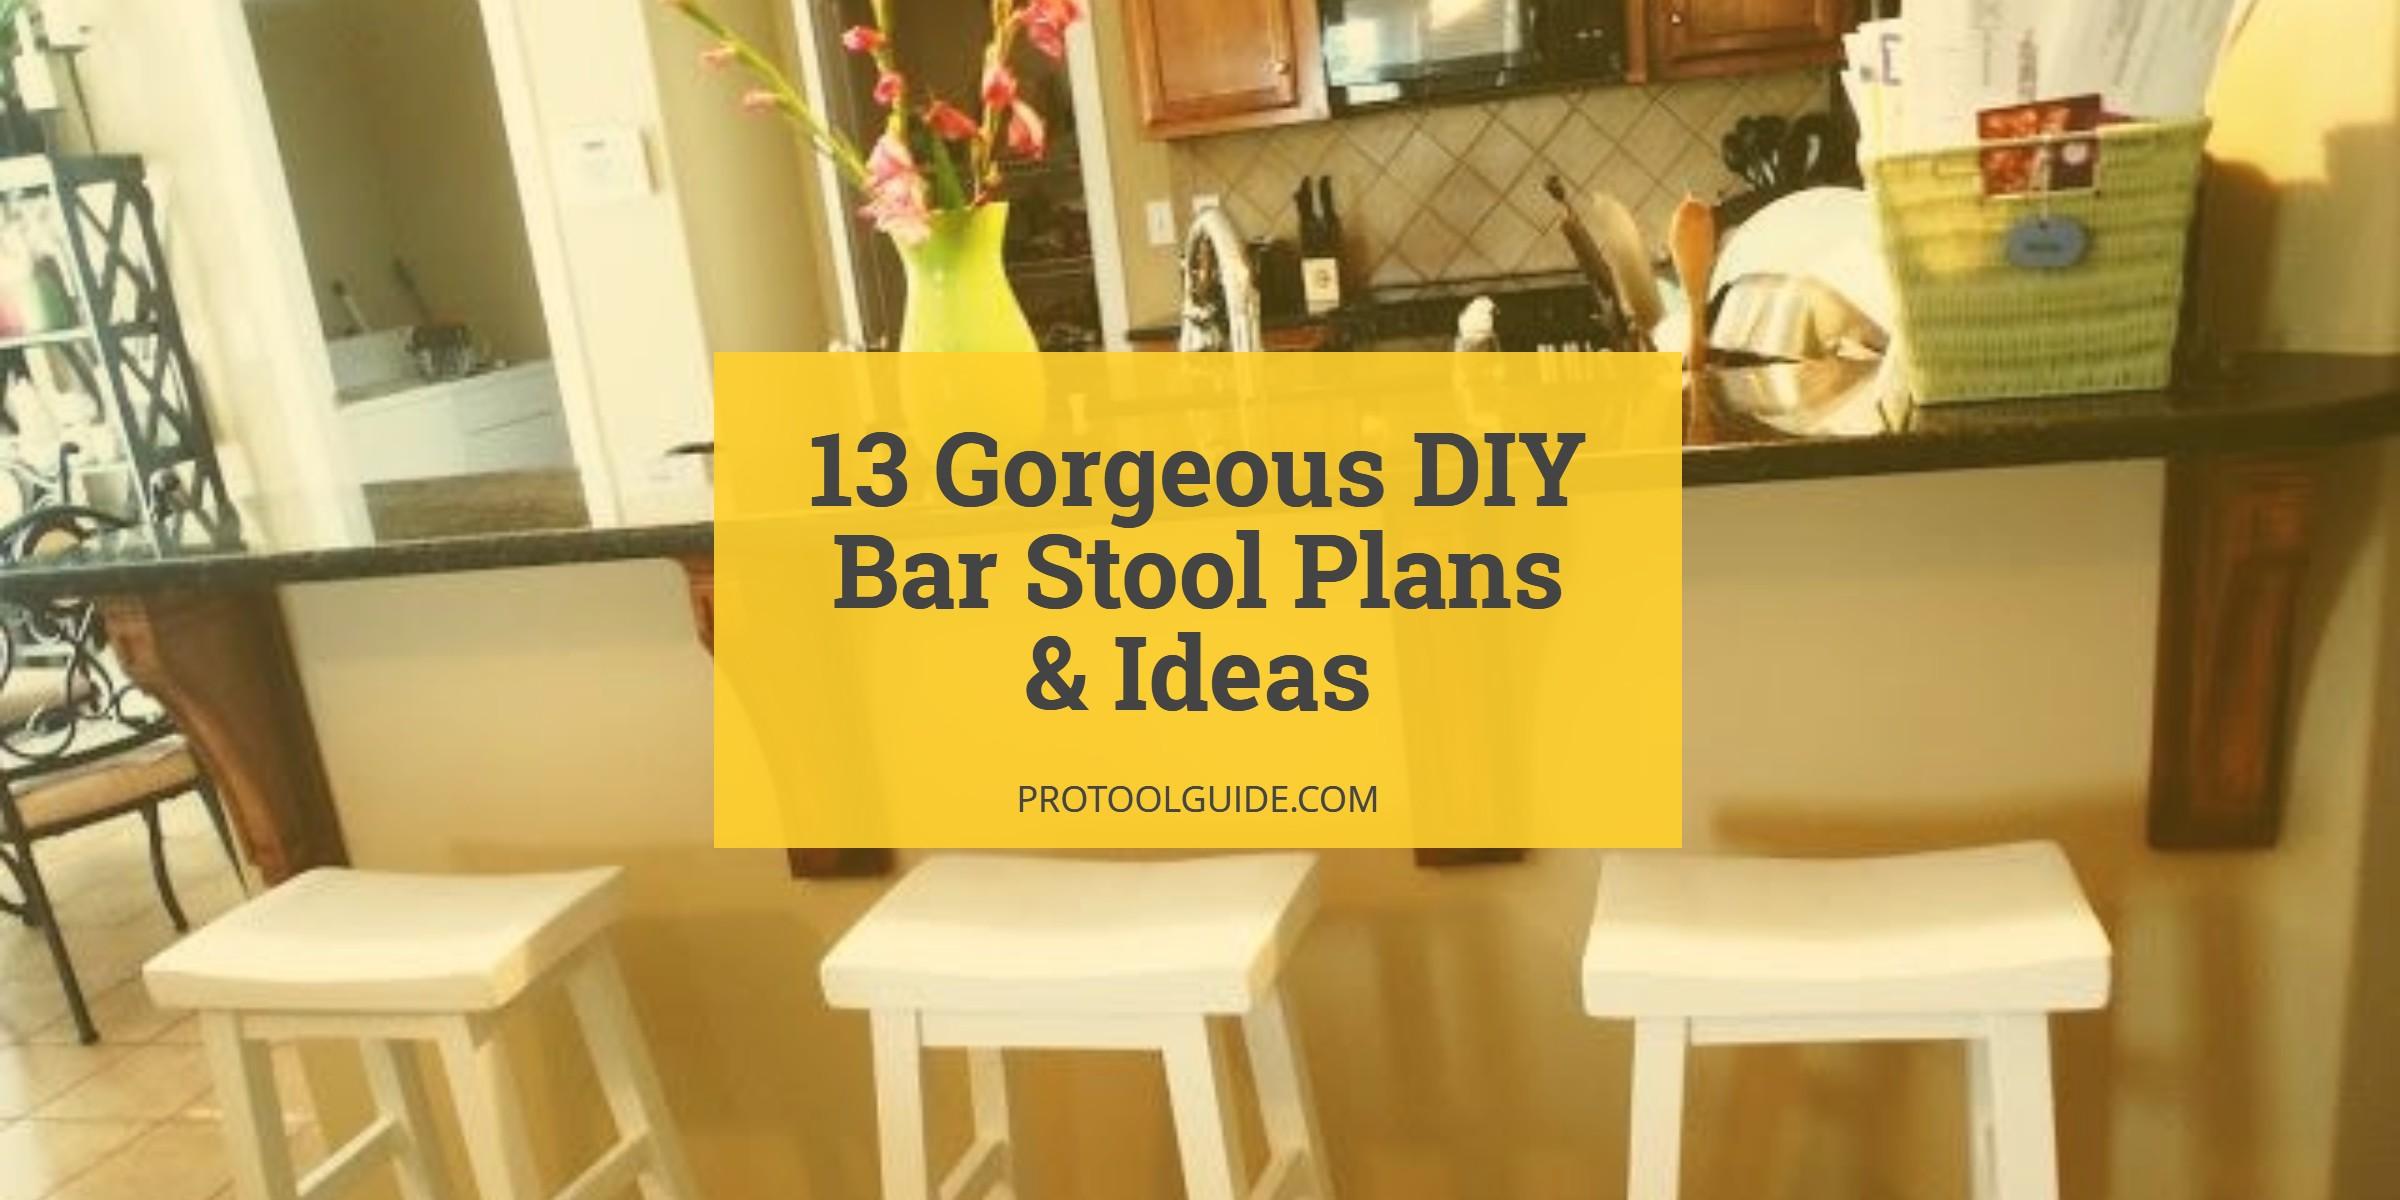 diy bar tool plans